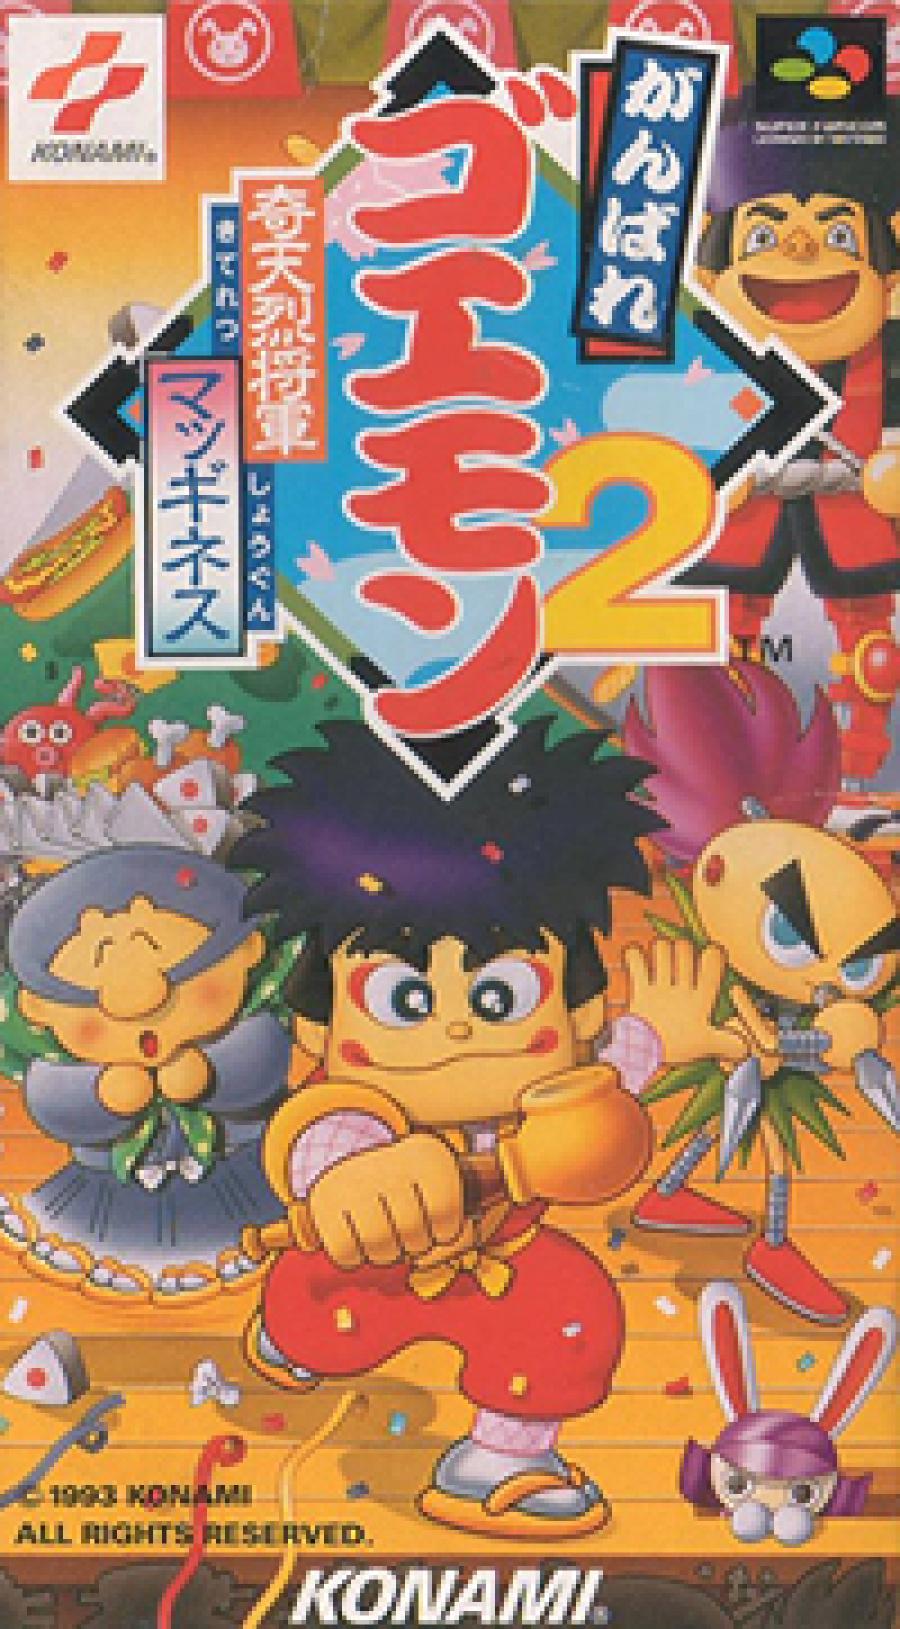 Ganbare Goemon 2 - Konami, could we have it, pretty please?